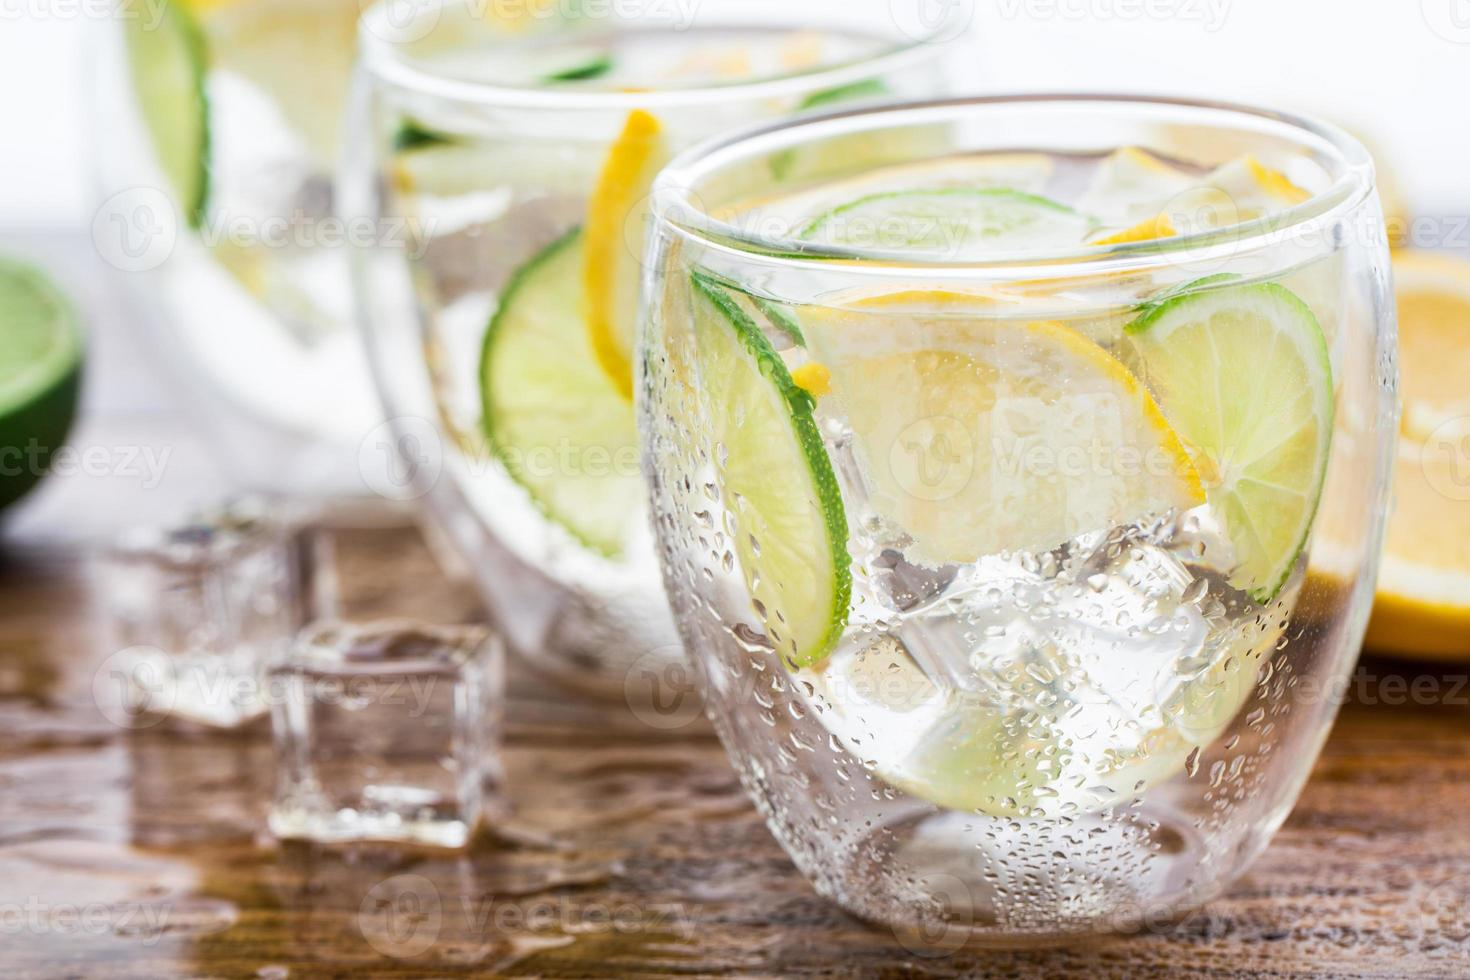 koude verse limonade foto